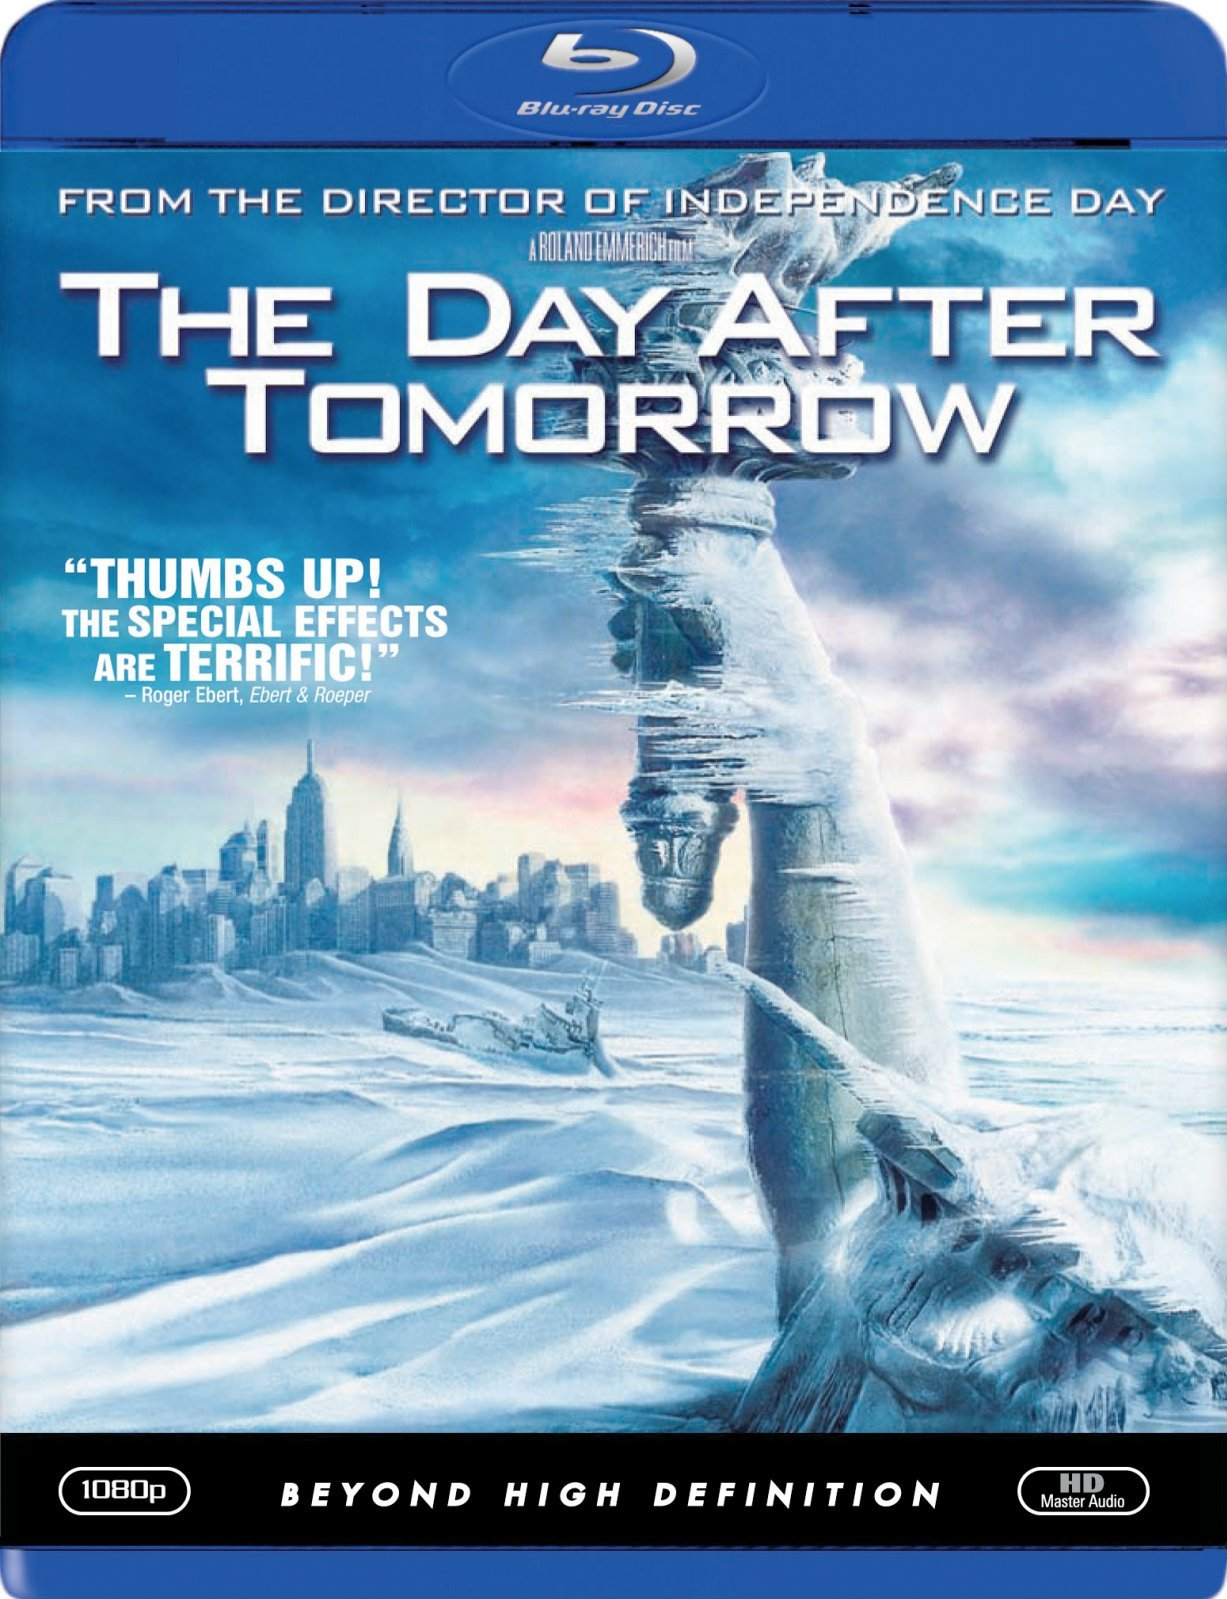 تحميل فيلم the day after tomorrow مترجم dvd